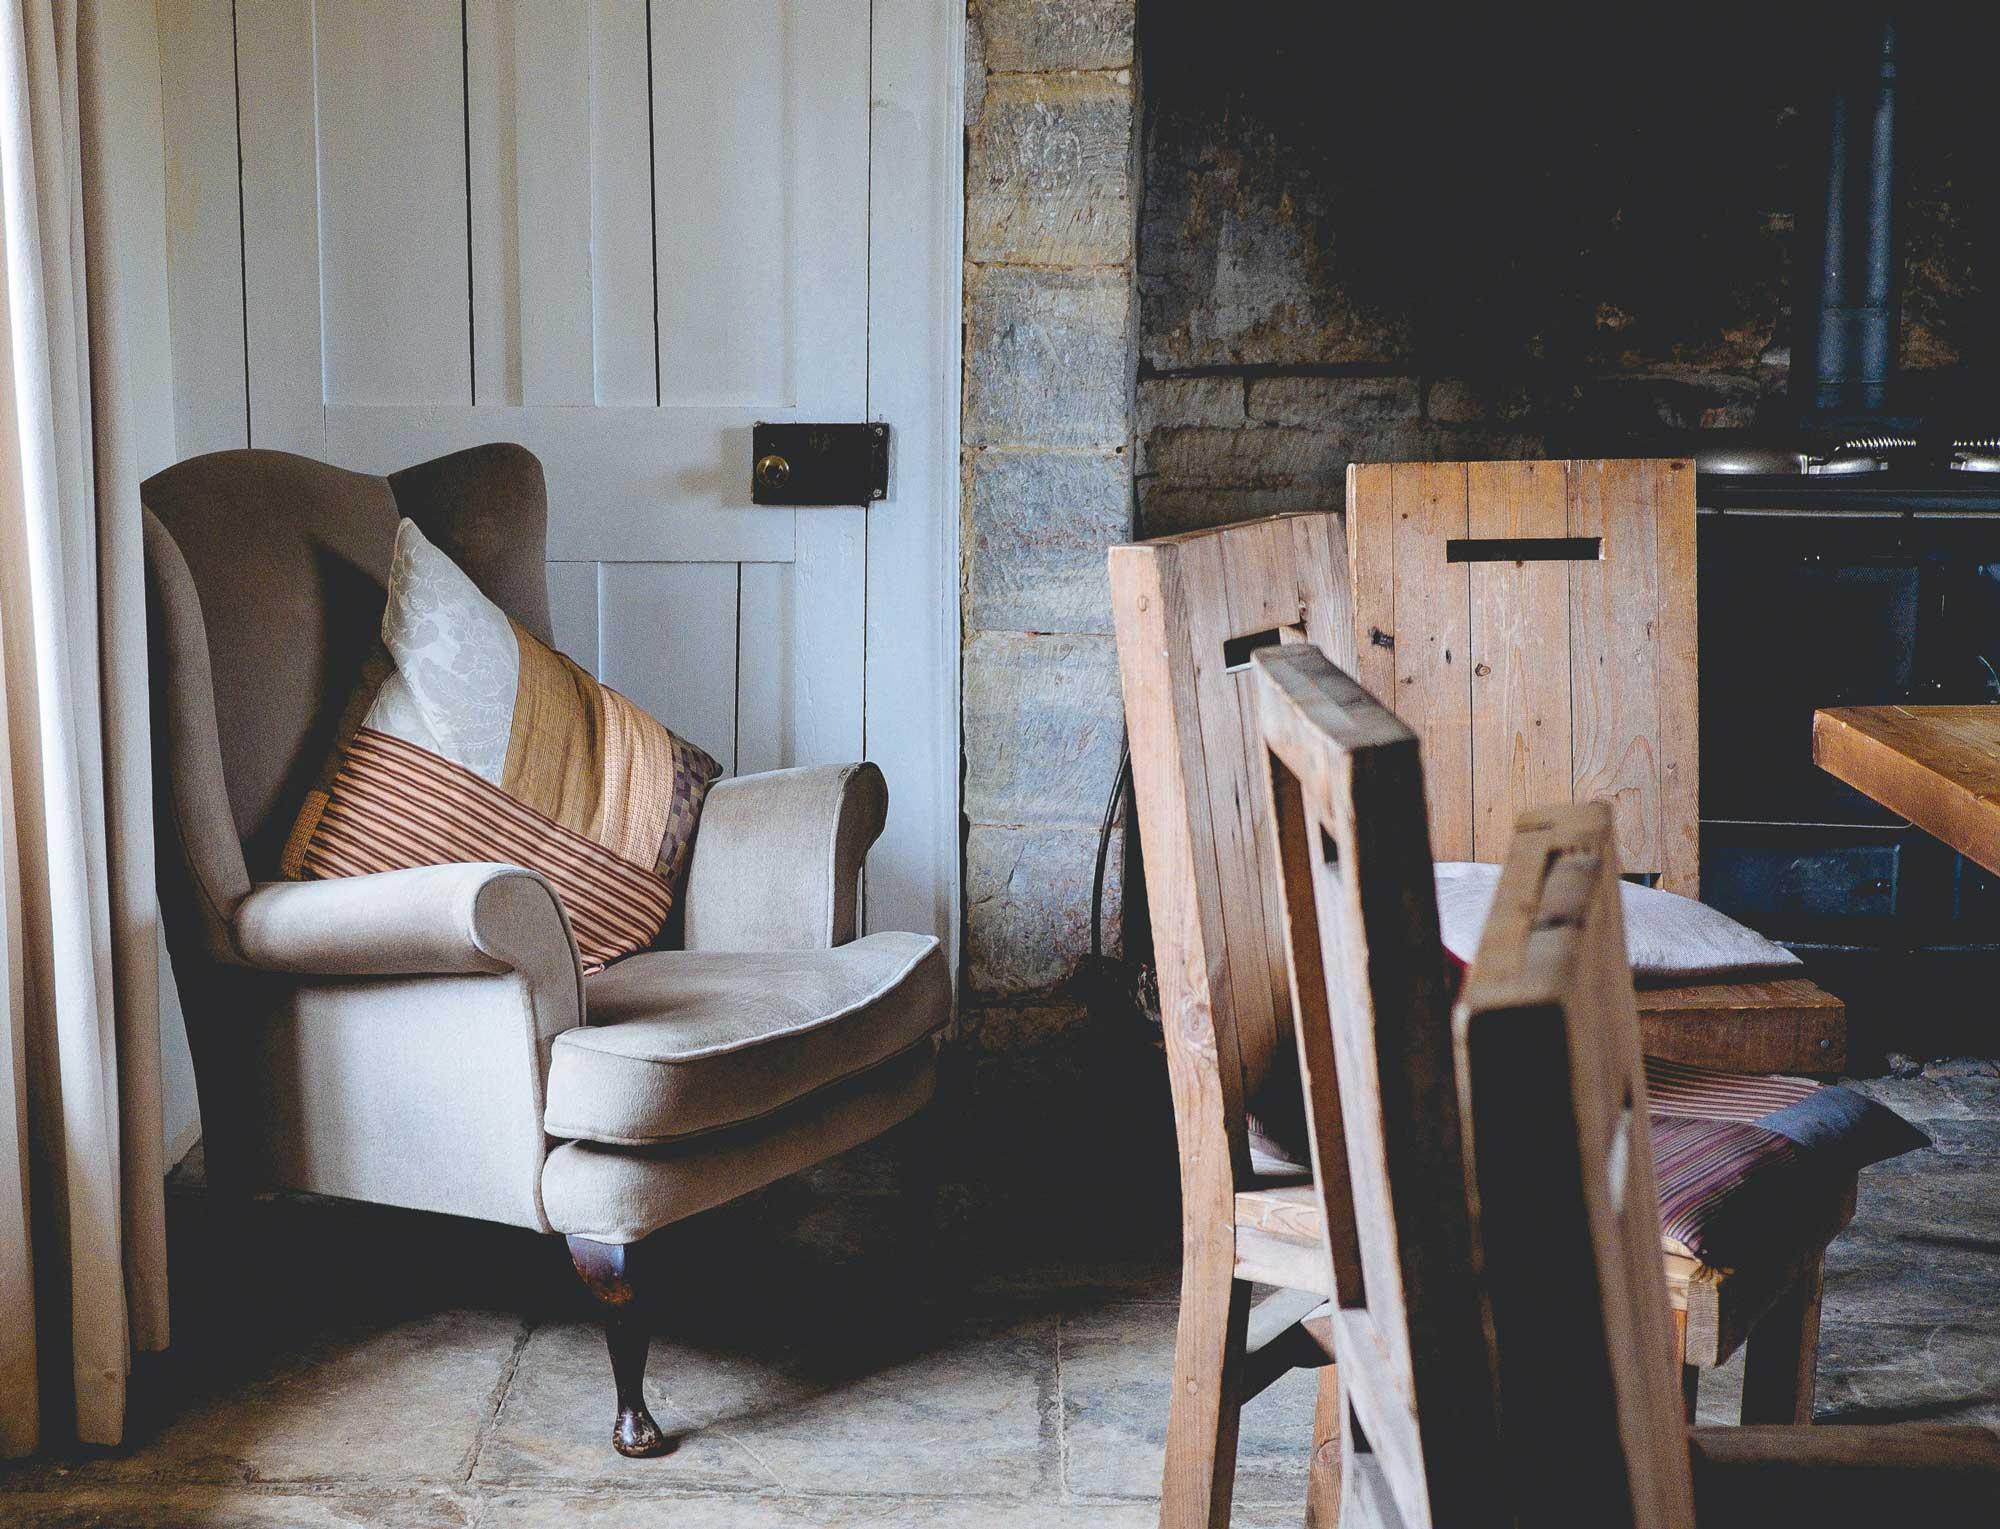 Beechwood-ranch-interior.jpg